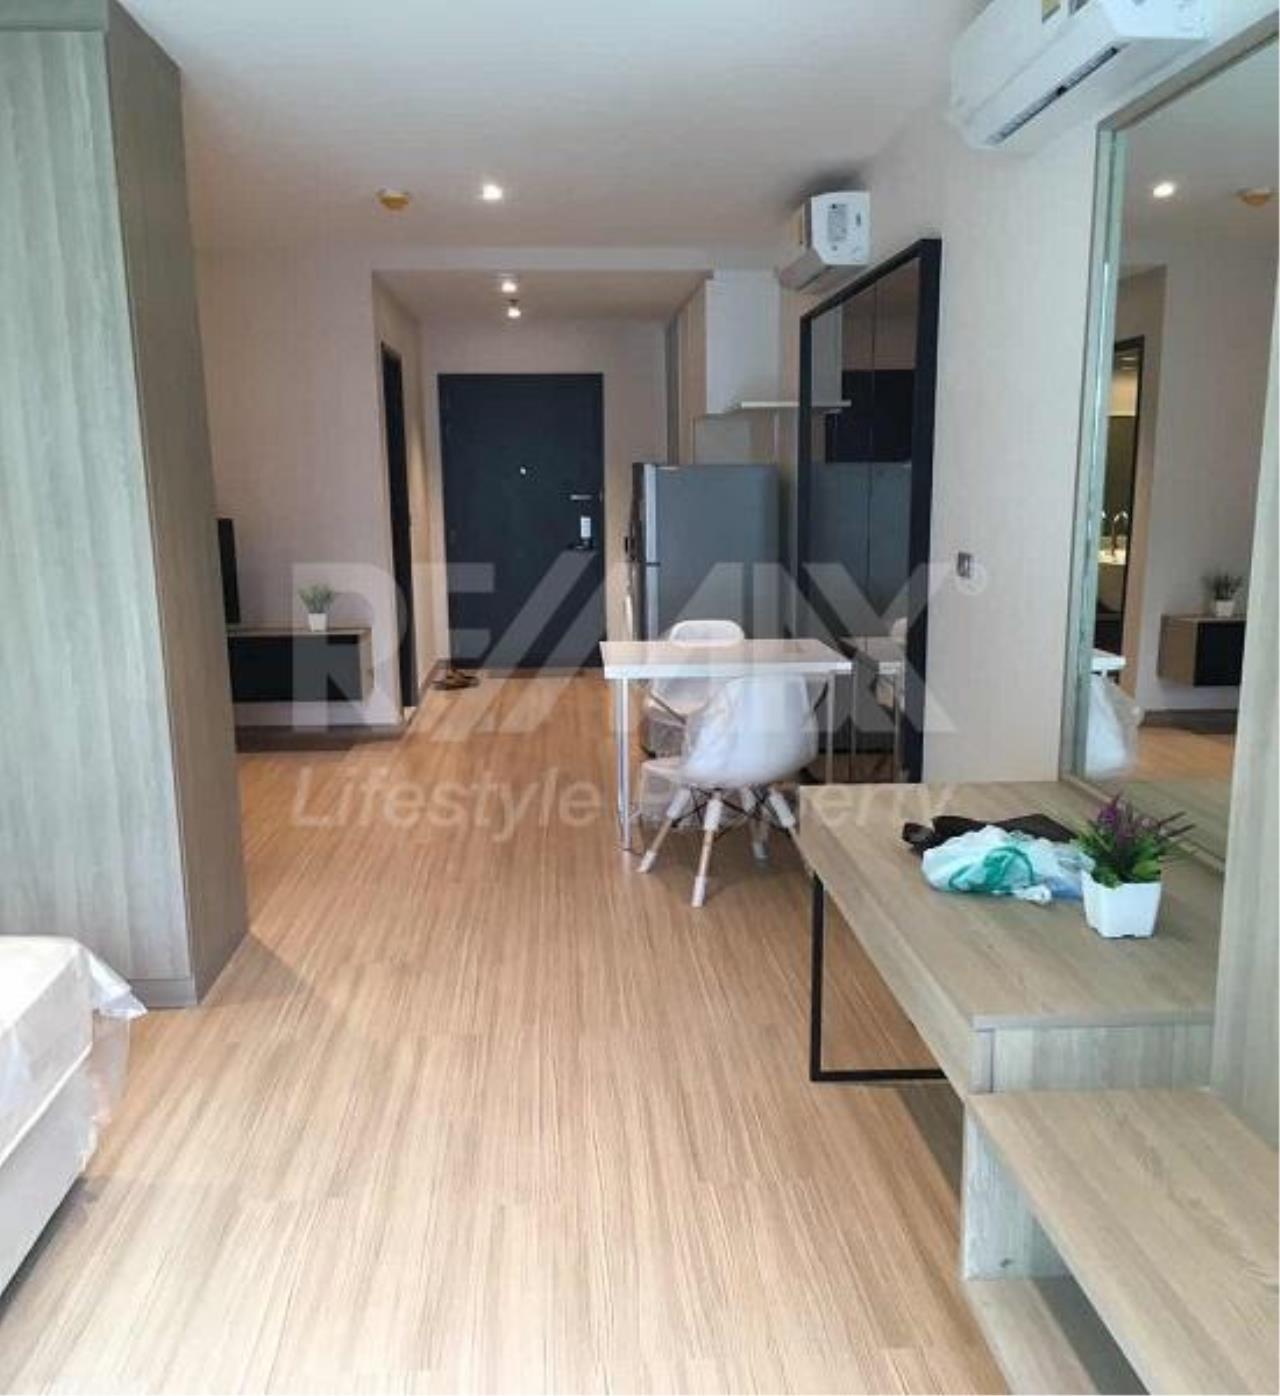 RE/MAX LifeStyle Property Agency's Sky Walk Condominium 15